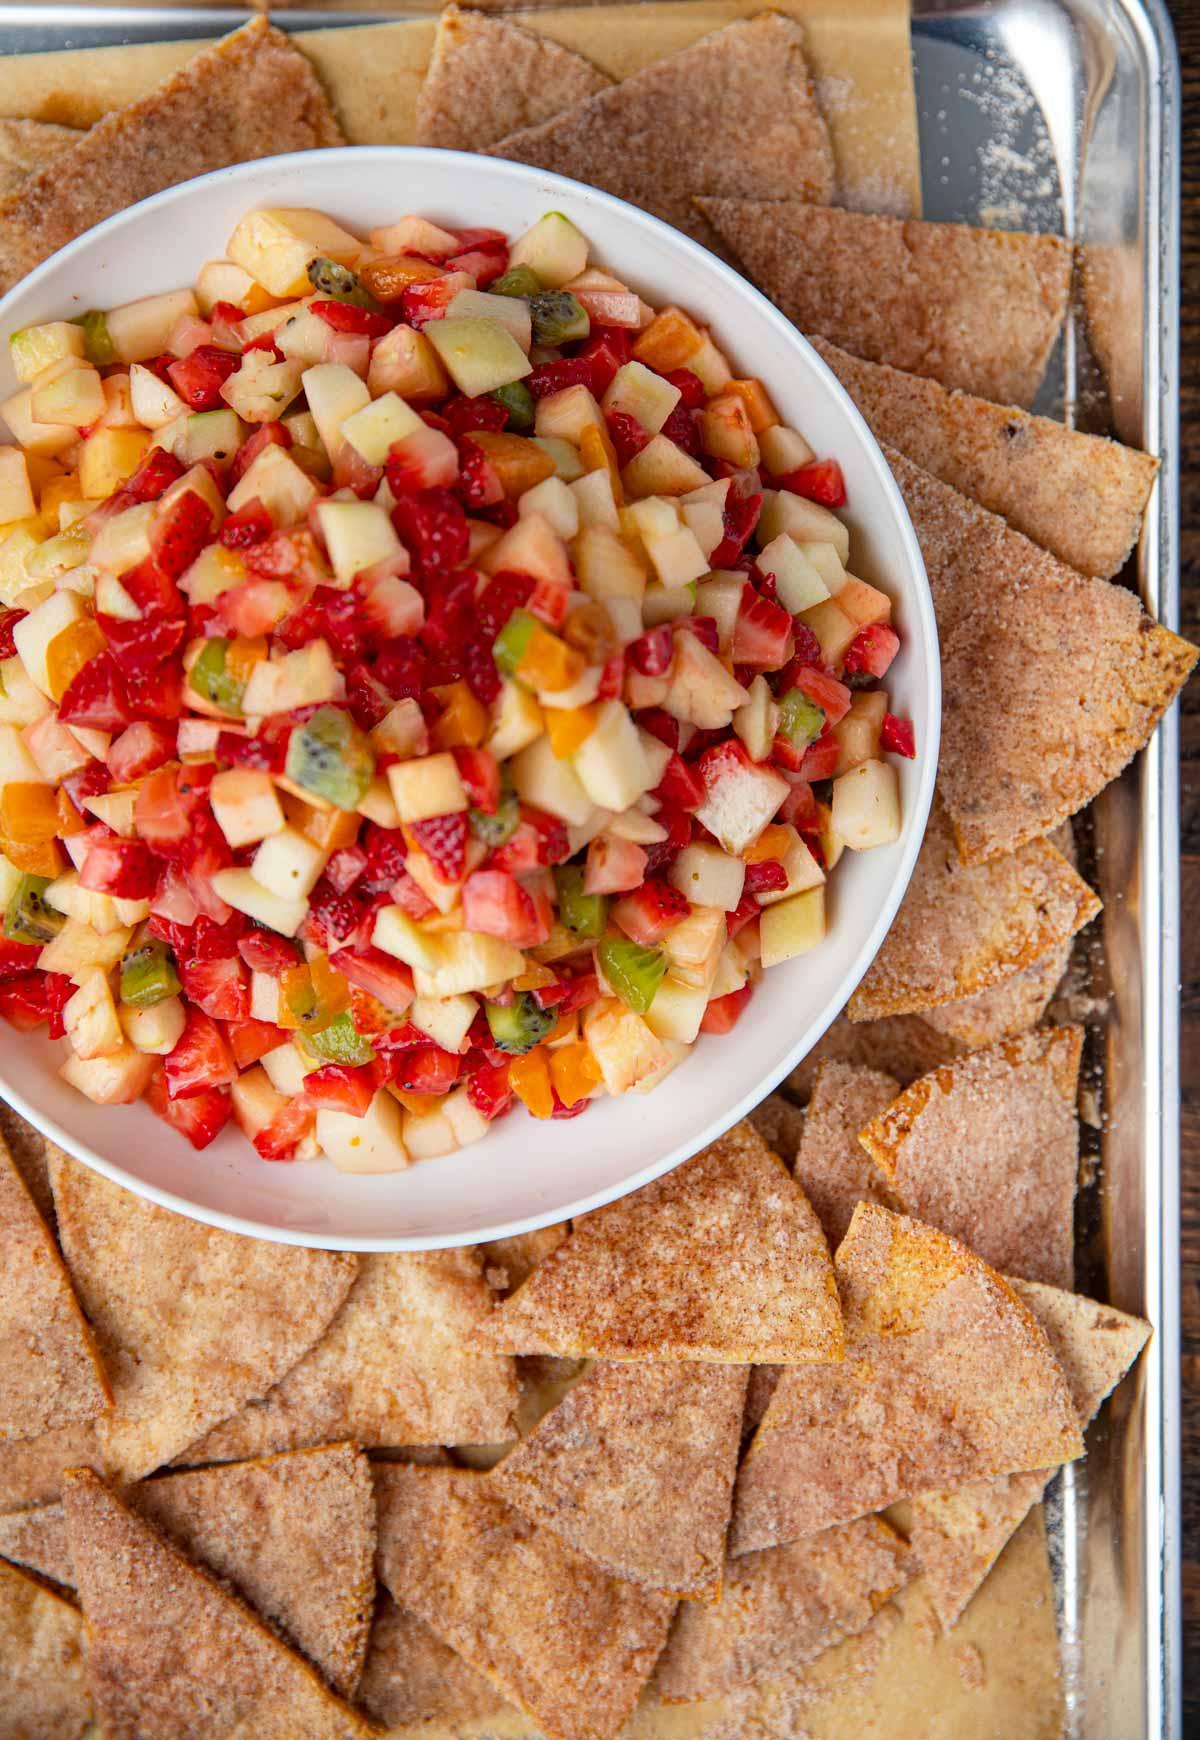 Cinnamon Sugar Chips with fruit salsa